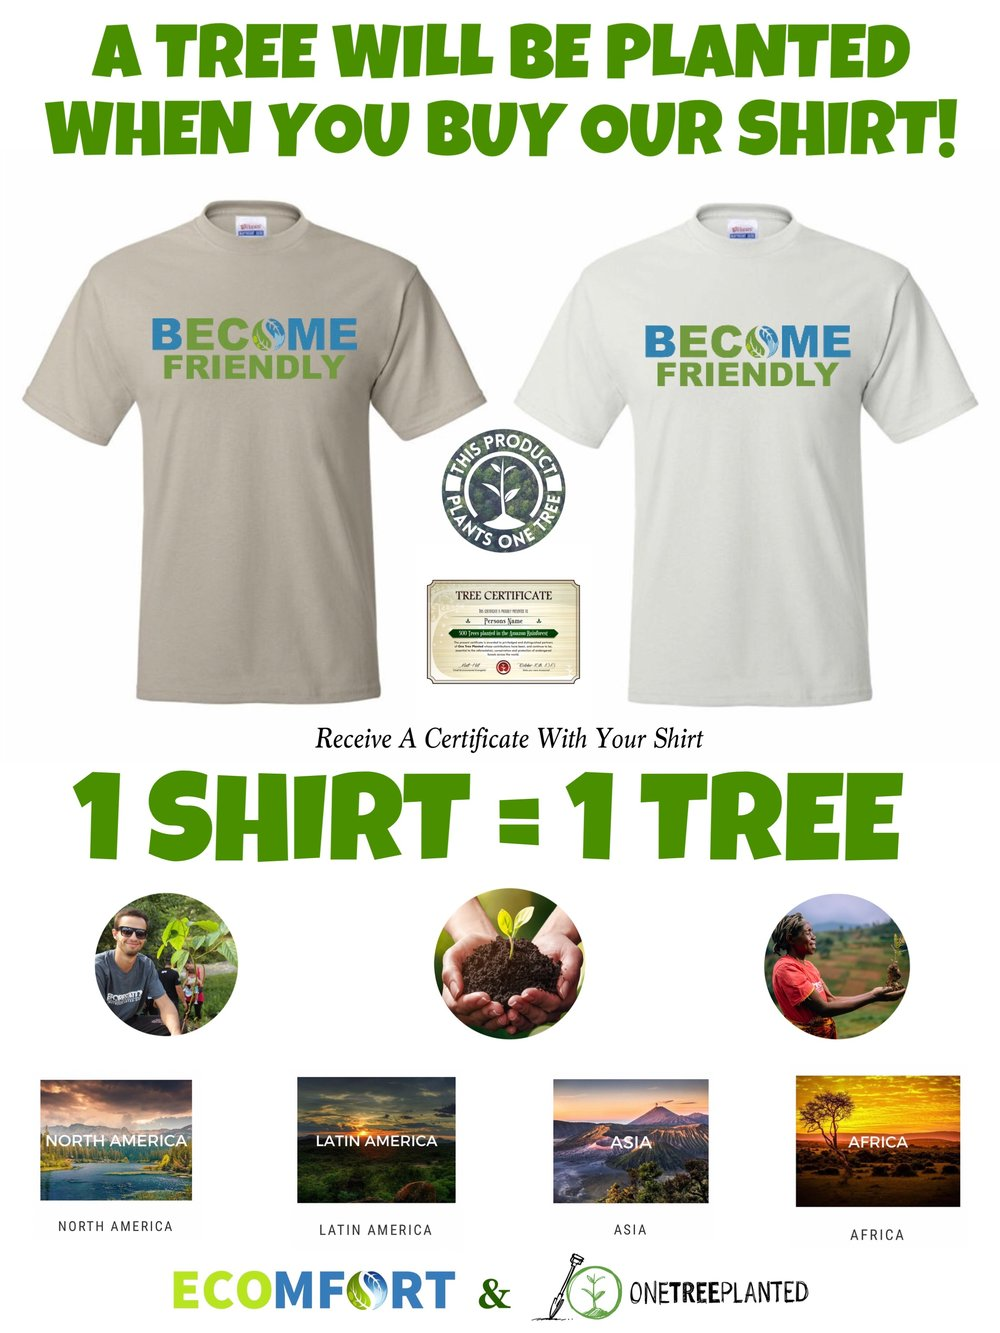 become friendly shirt grid .JPG